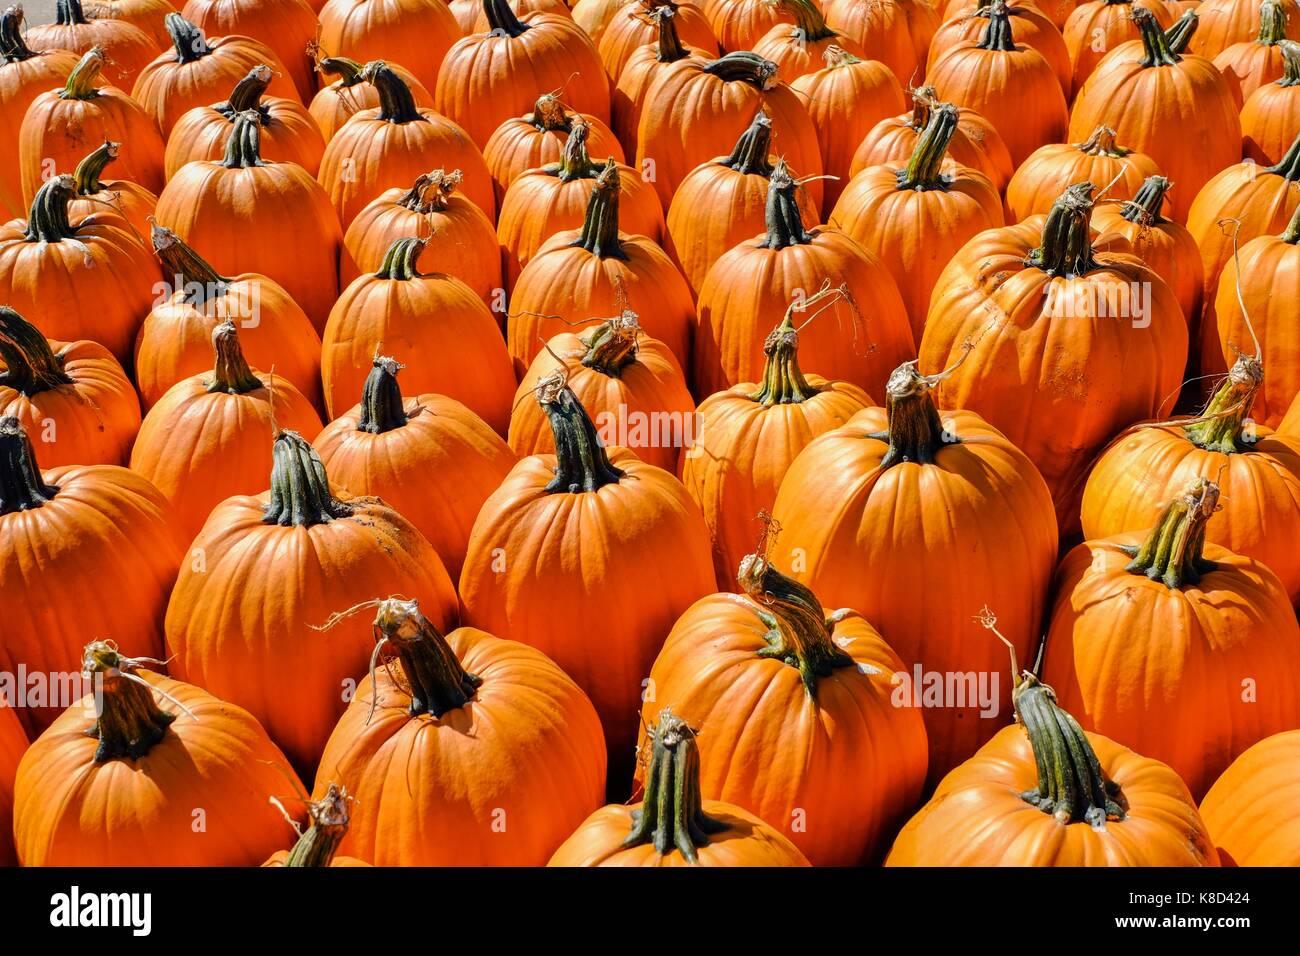 Pile of pumpkin at a fresh market - Stock Image